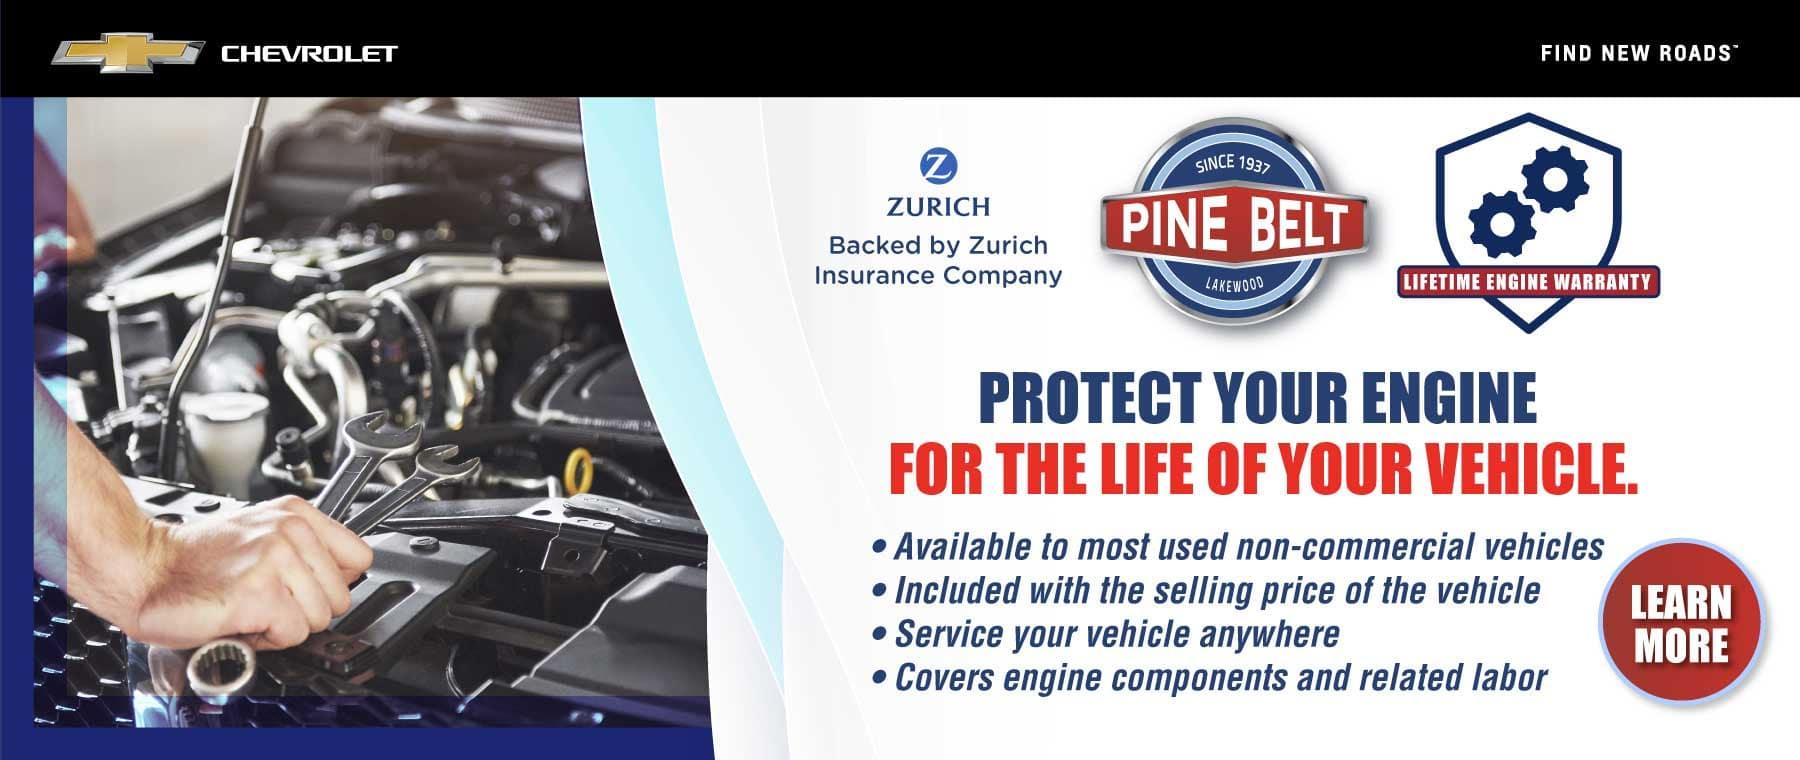 PBE-2066-Lifetime-Warranty-Banners_Chevy_Slider (1)